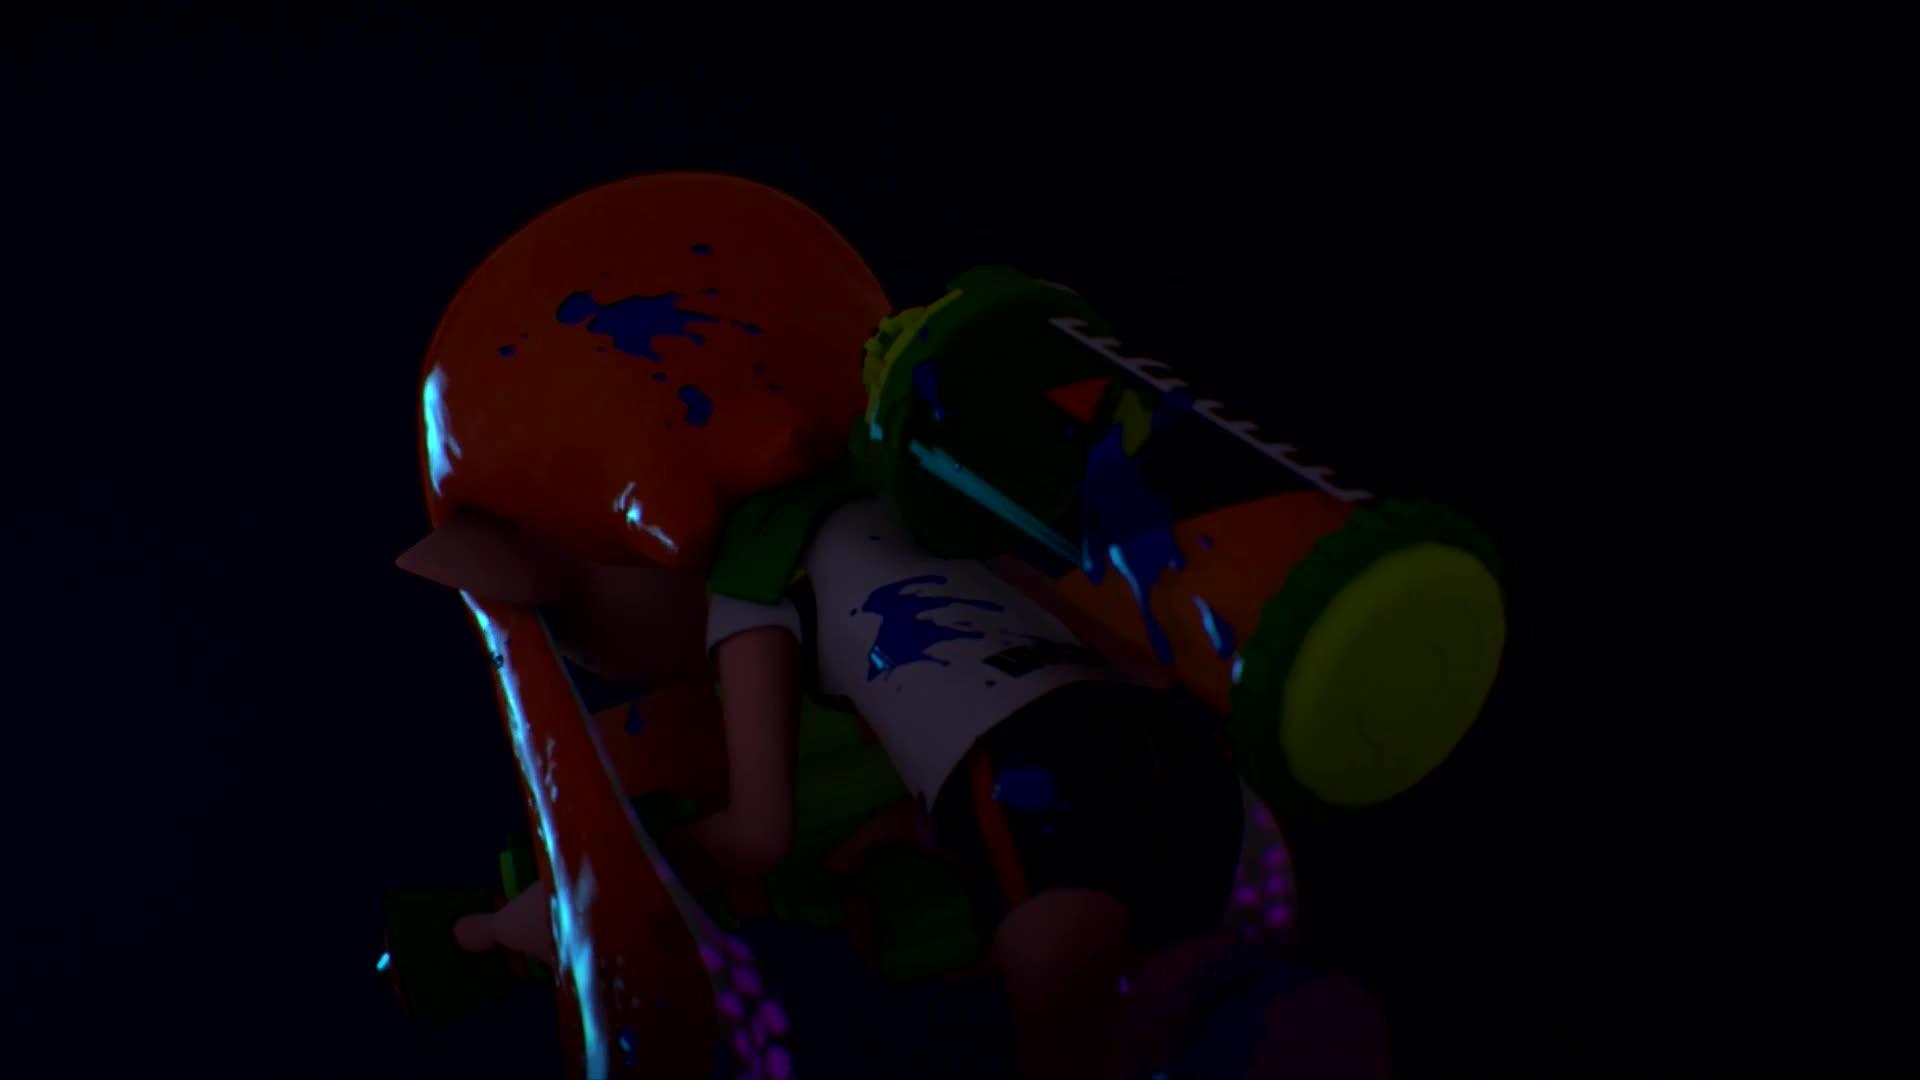 Splatoon Smash GIFs